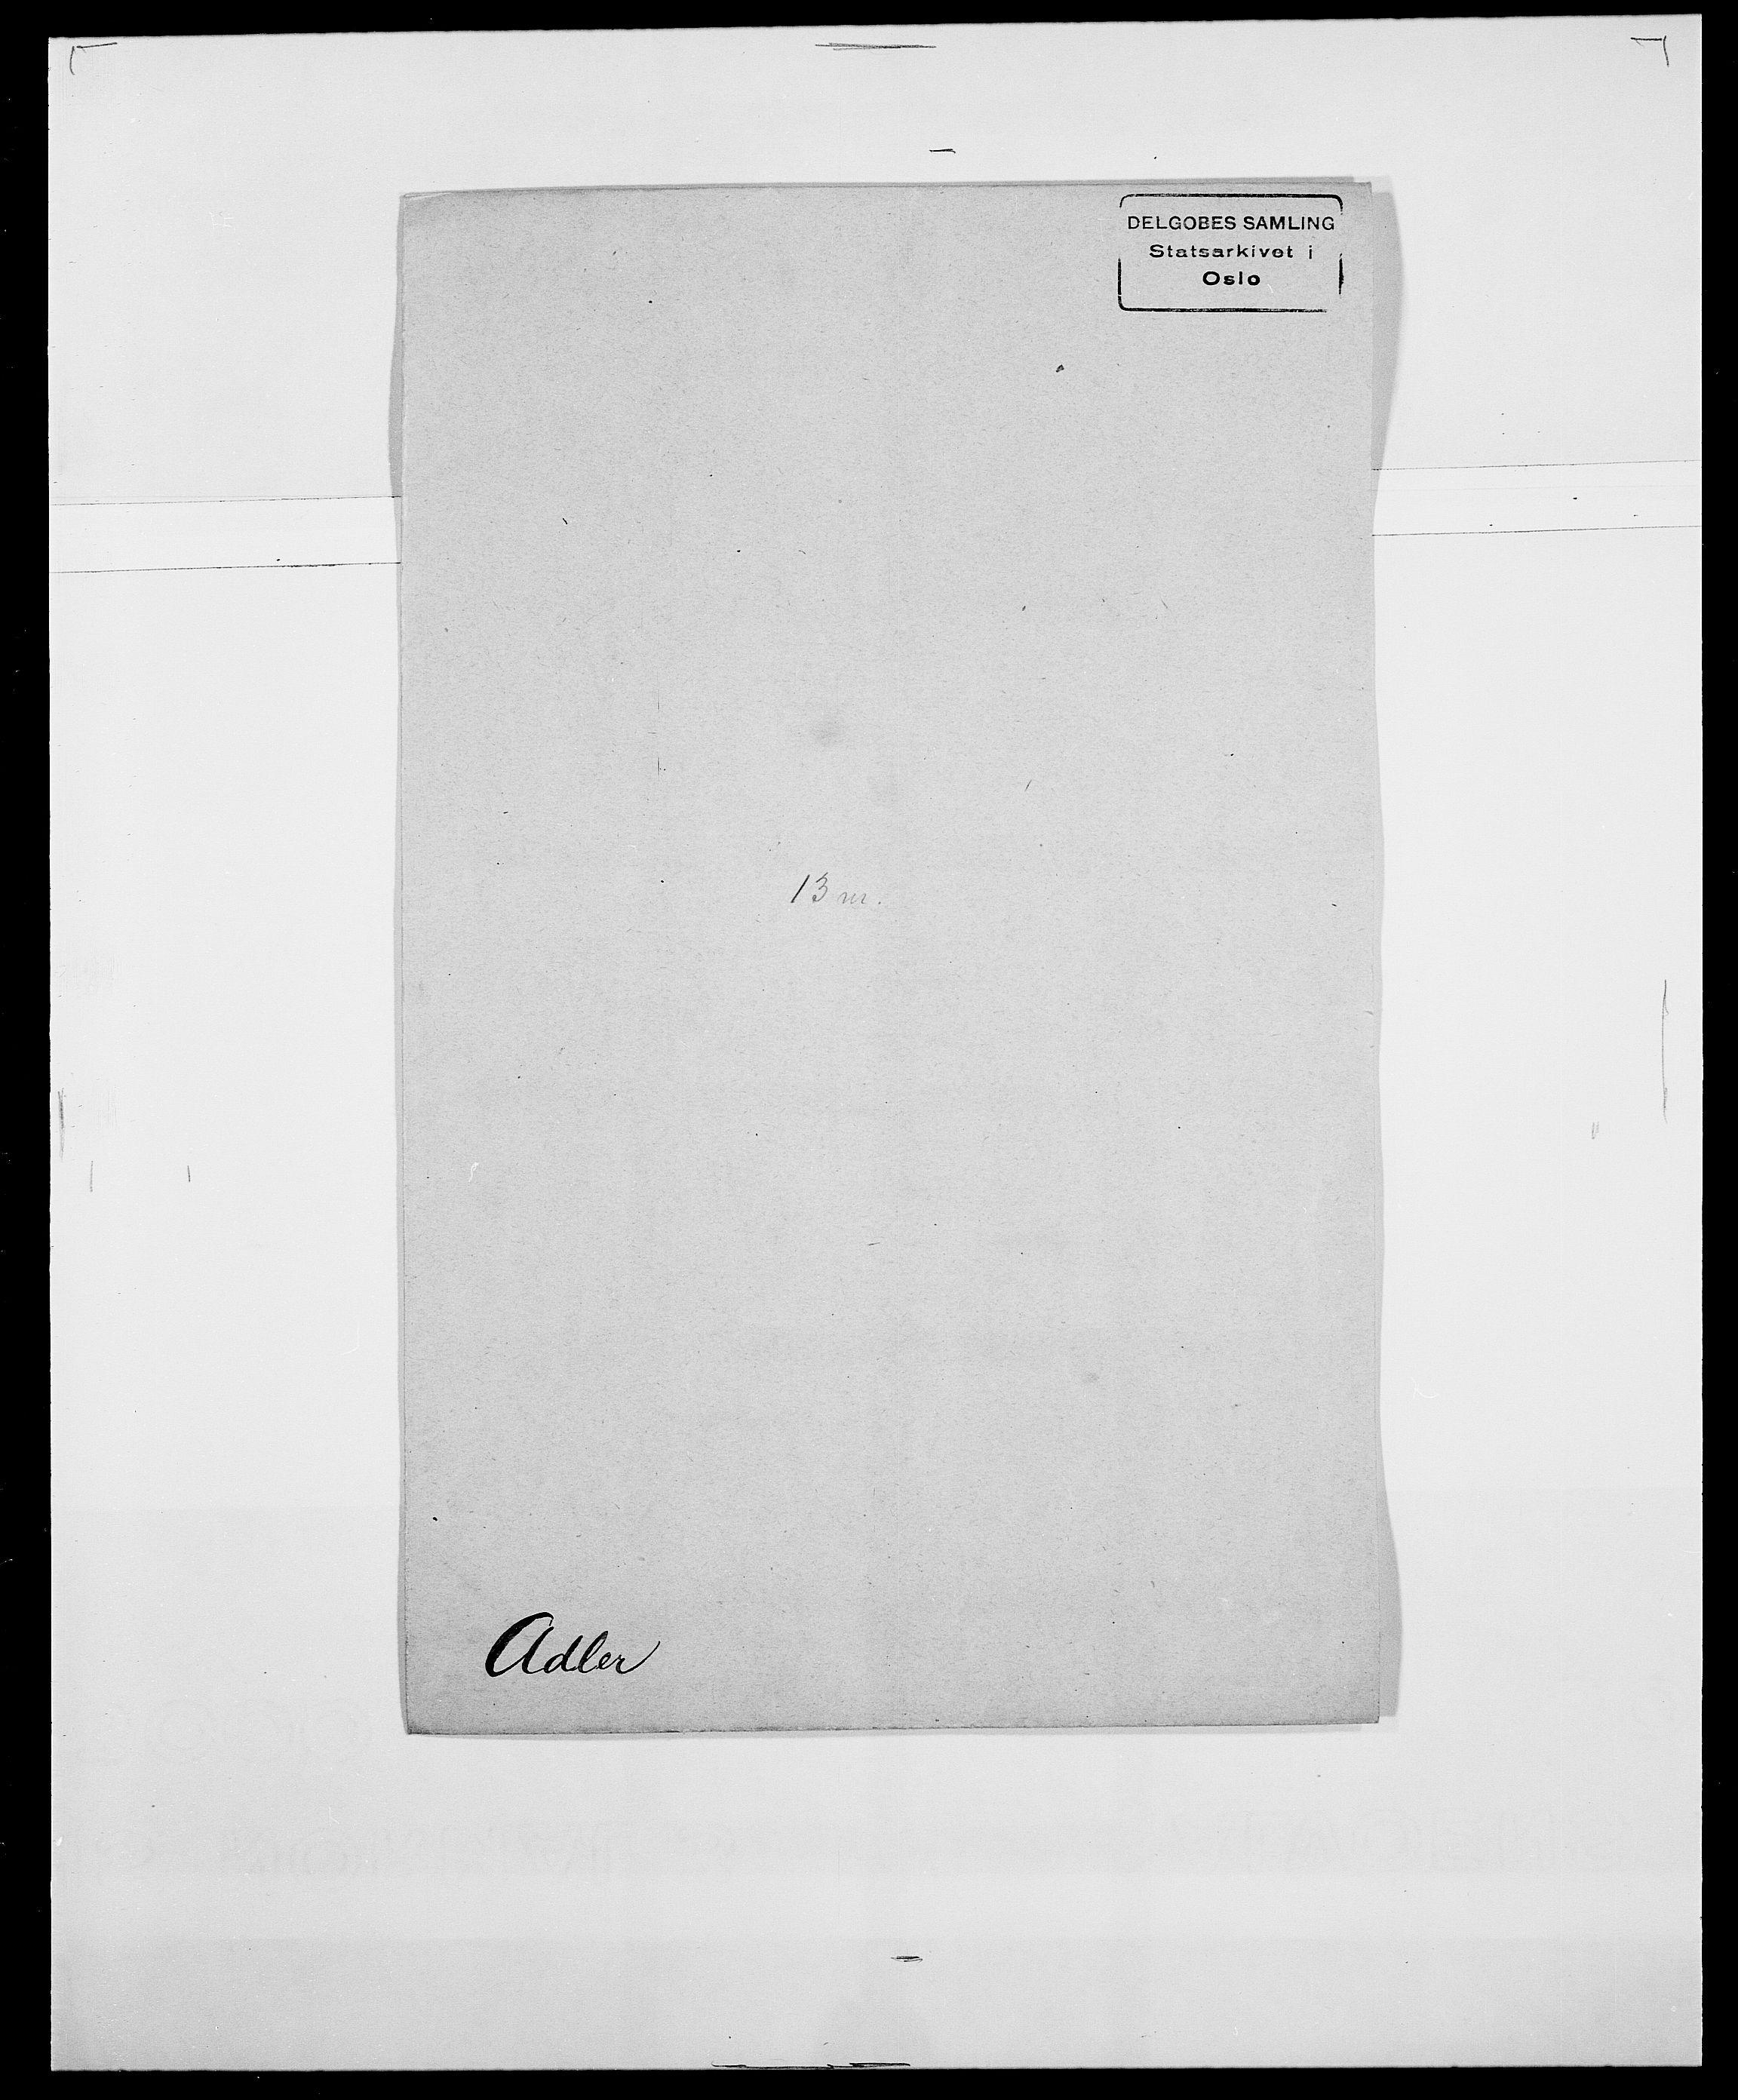 SAO, Delgobe, Charles Antoine - samling, D/Da/L0001: Aabye - Angerman, s. 254